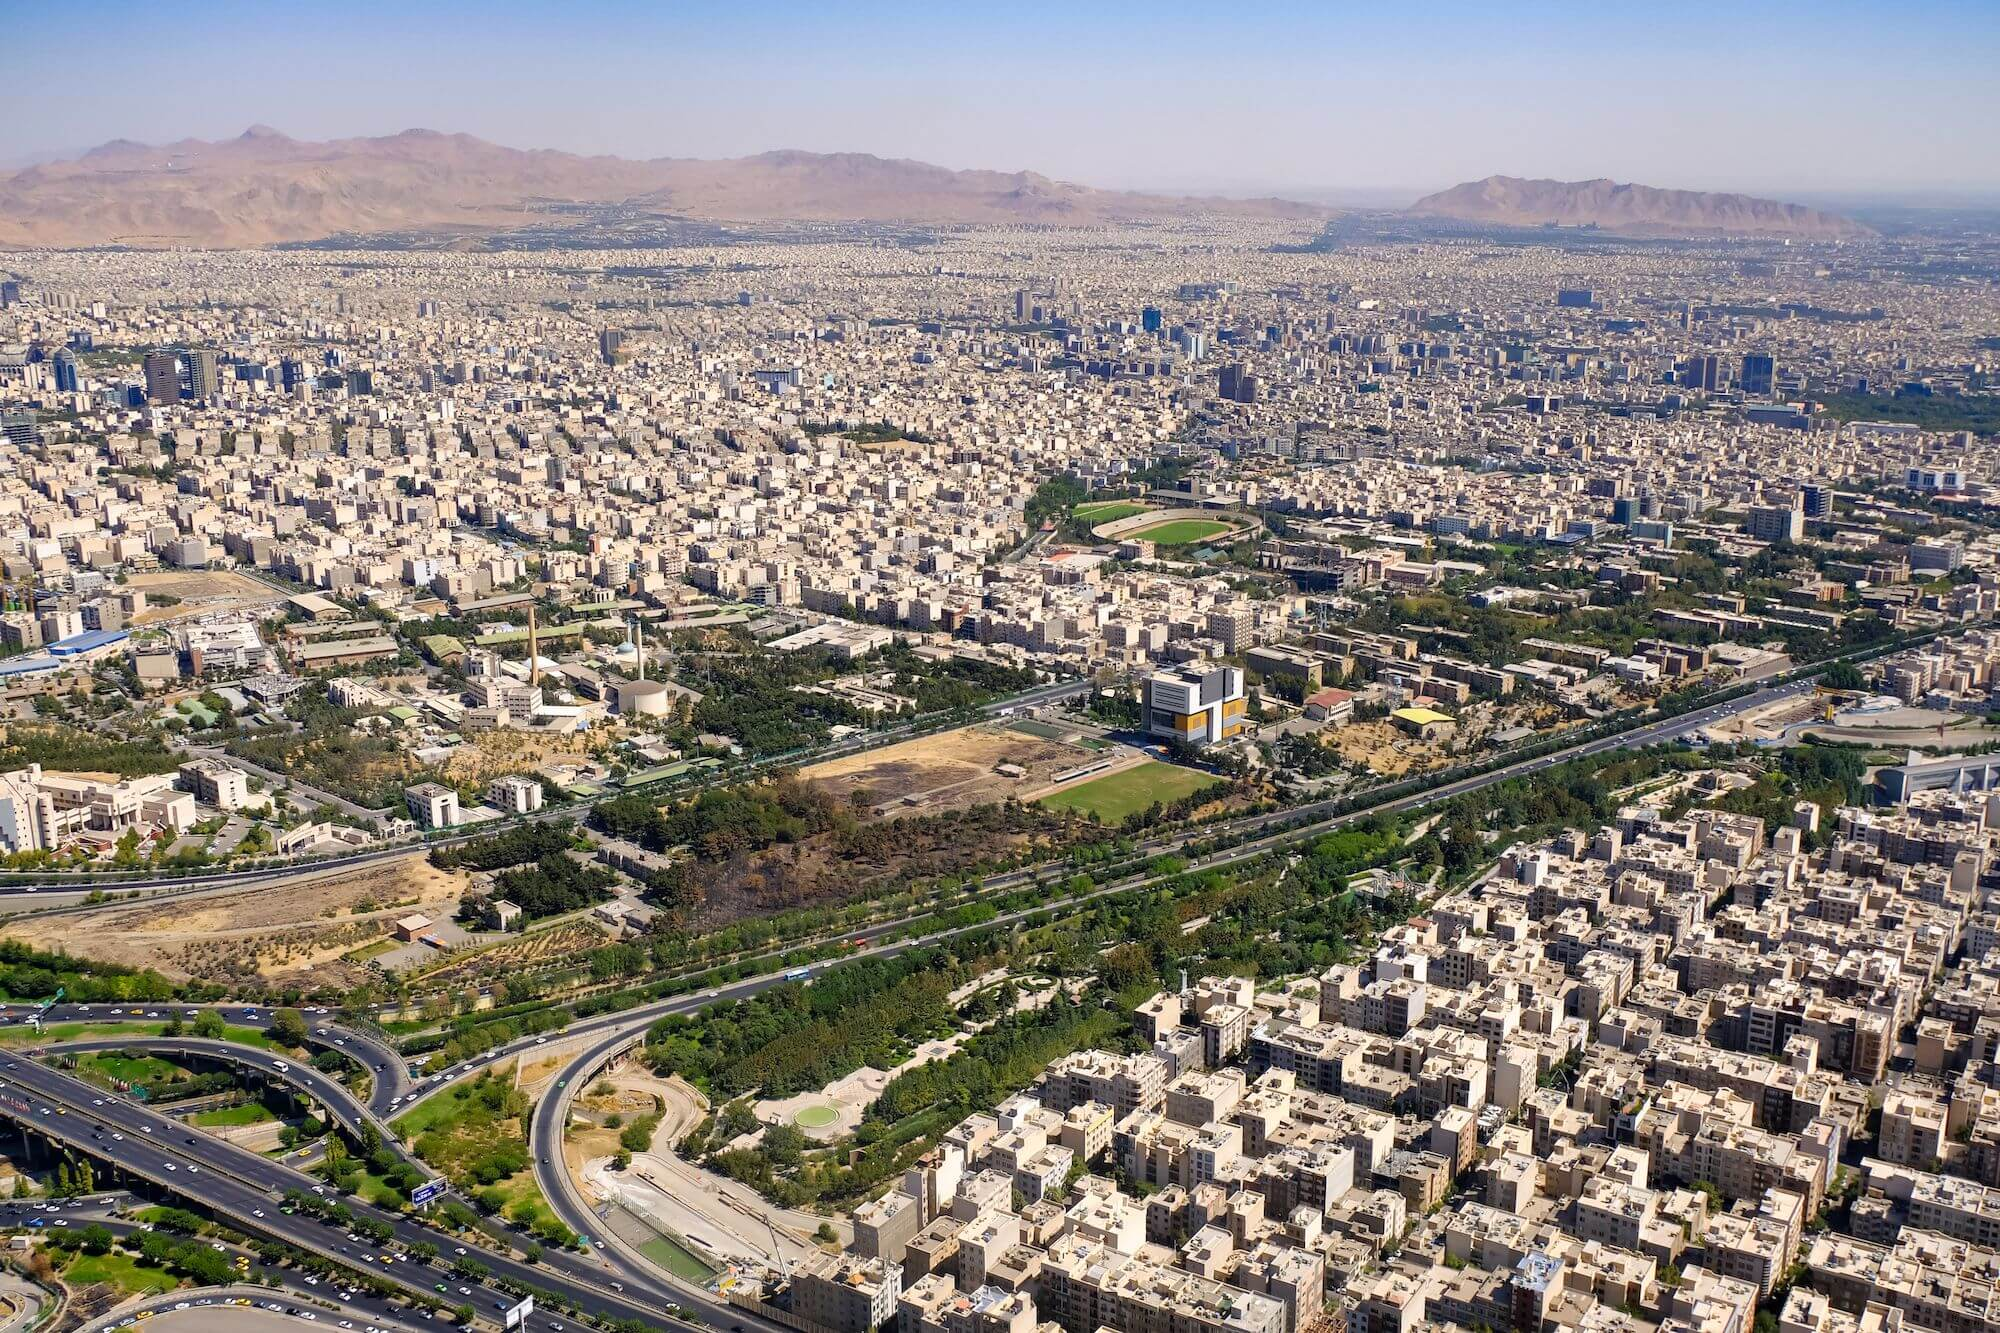 Teheran 2 compressor 3 giorni a Teheran